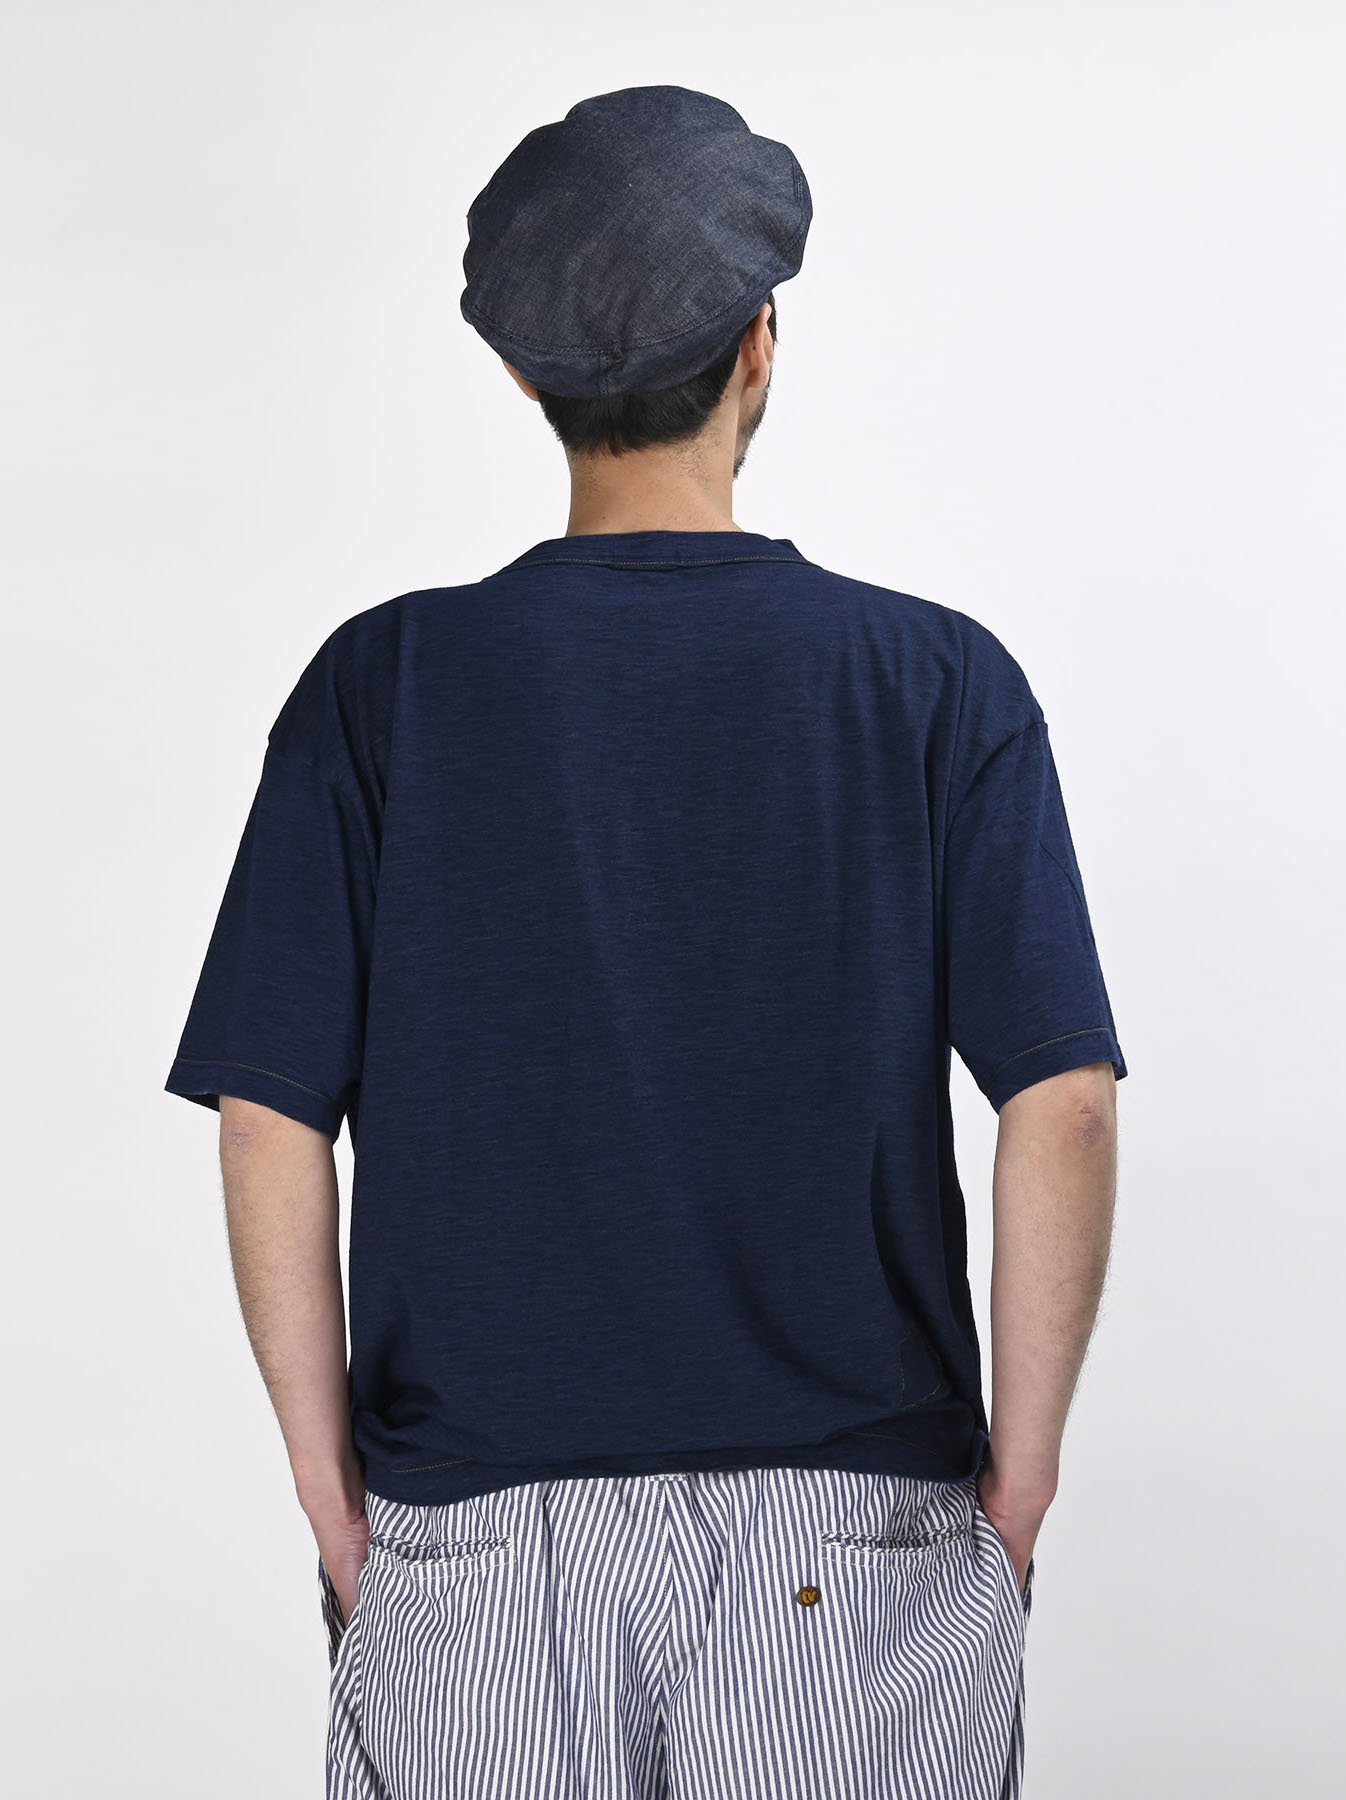 Indigo Hayama-kun Embroidered 908 Ocean T-shirt (0621)-5